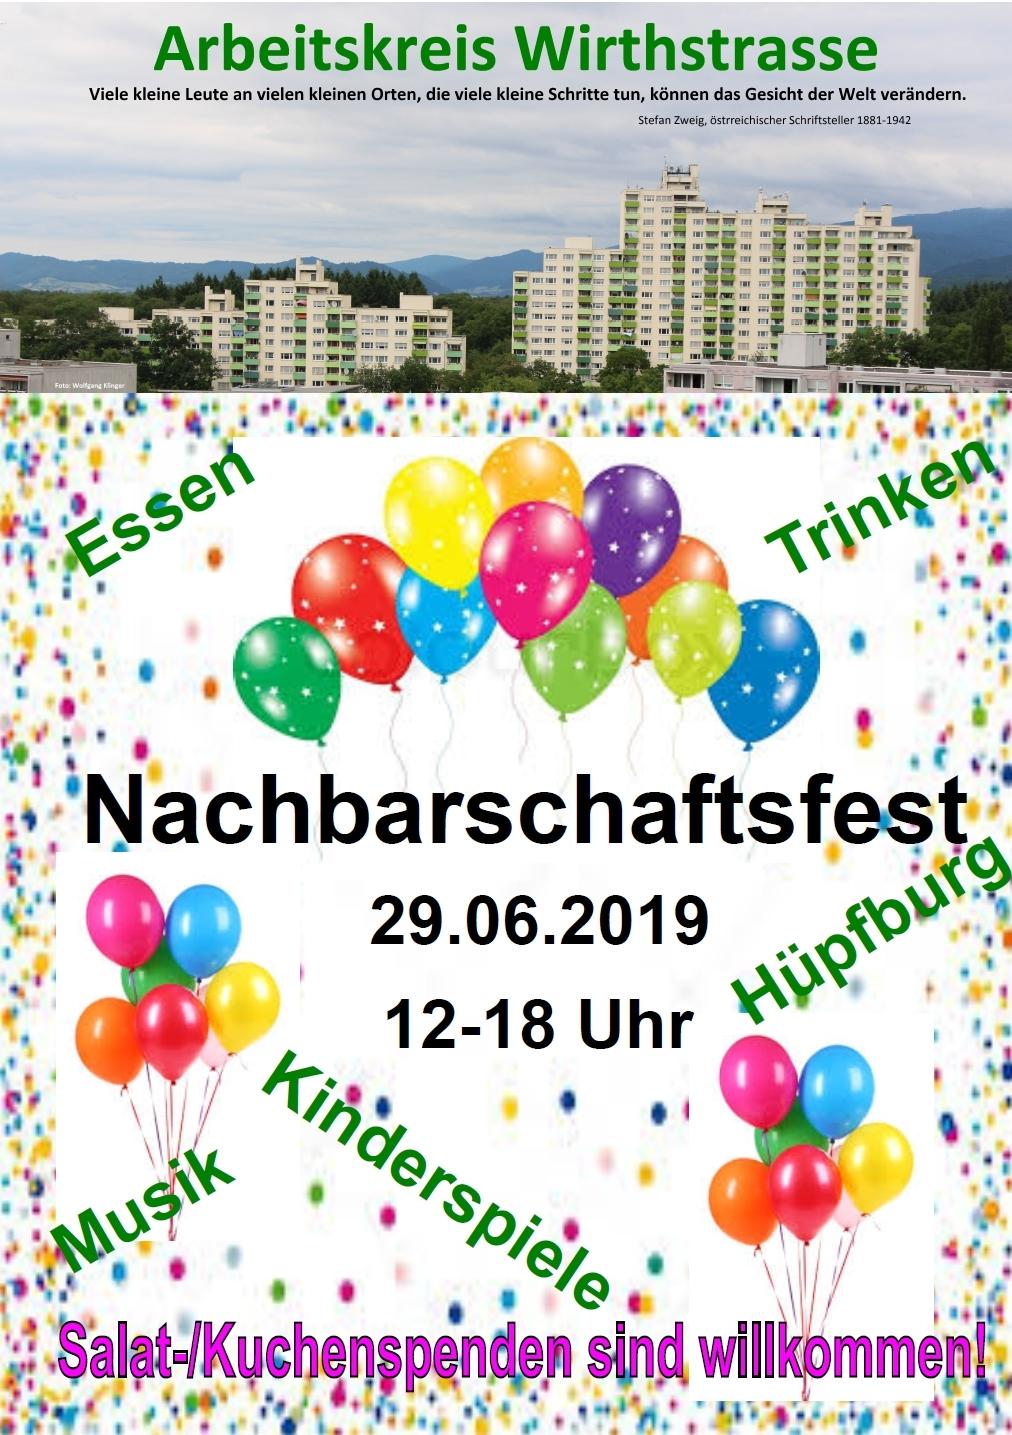 https://hdb-freiburg.de/wp-content/uploads/2019/06/Fruehlingsfest_2019.jpg